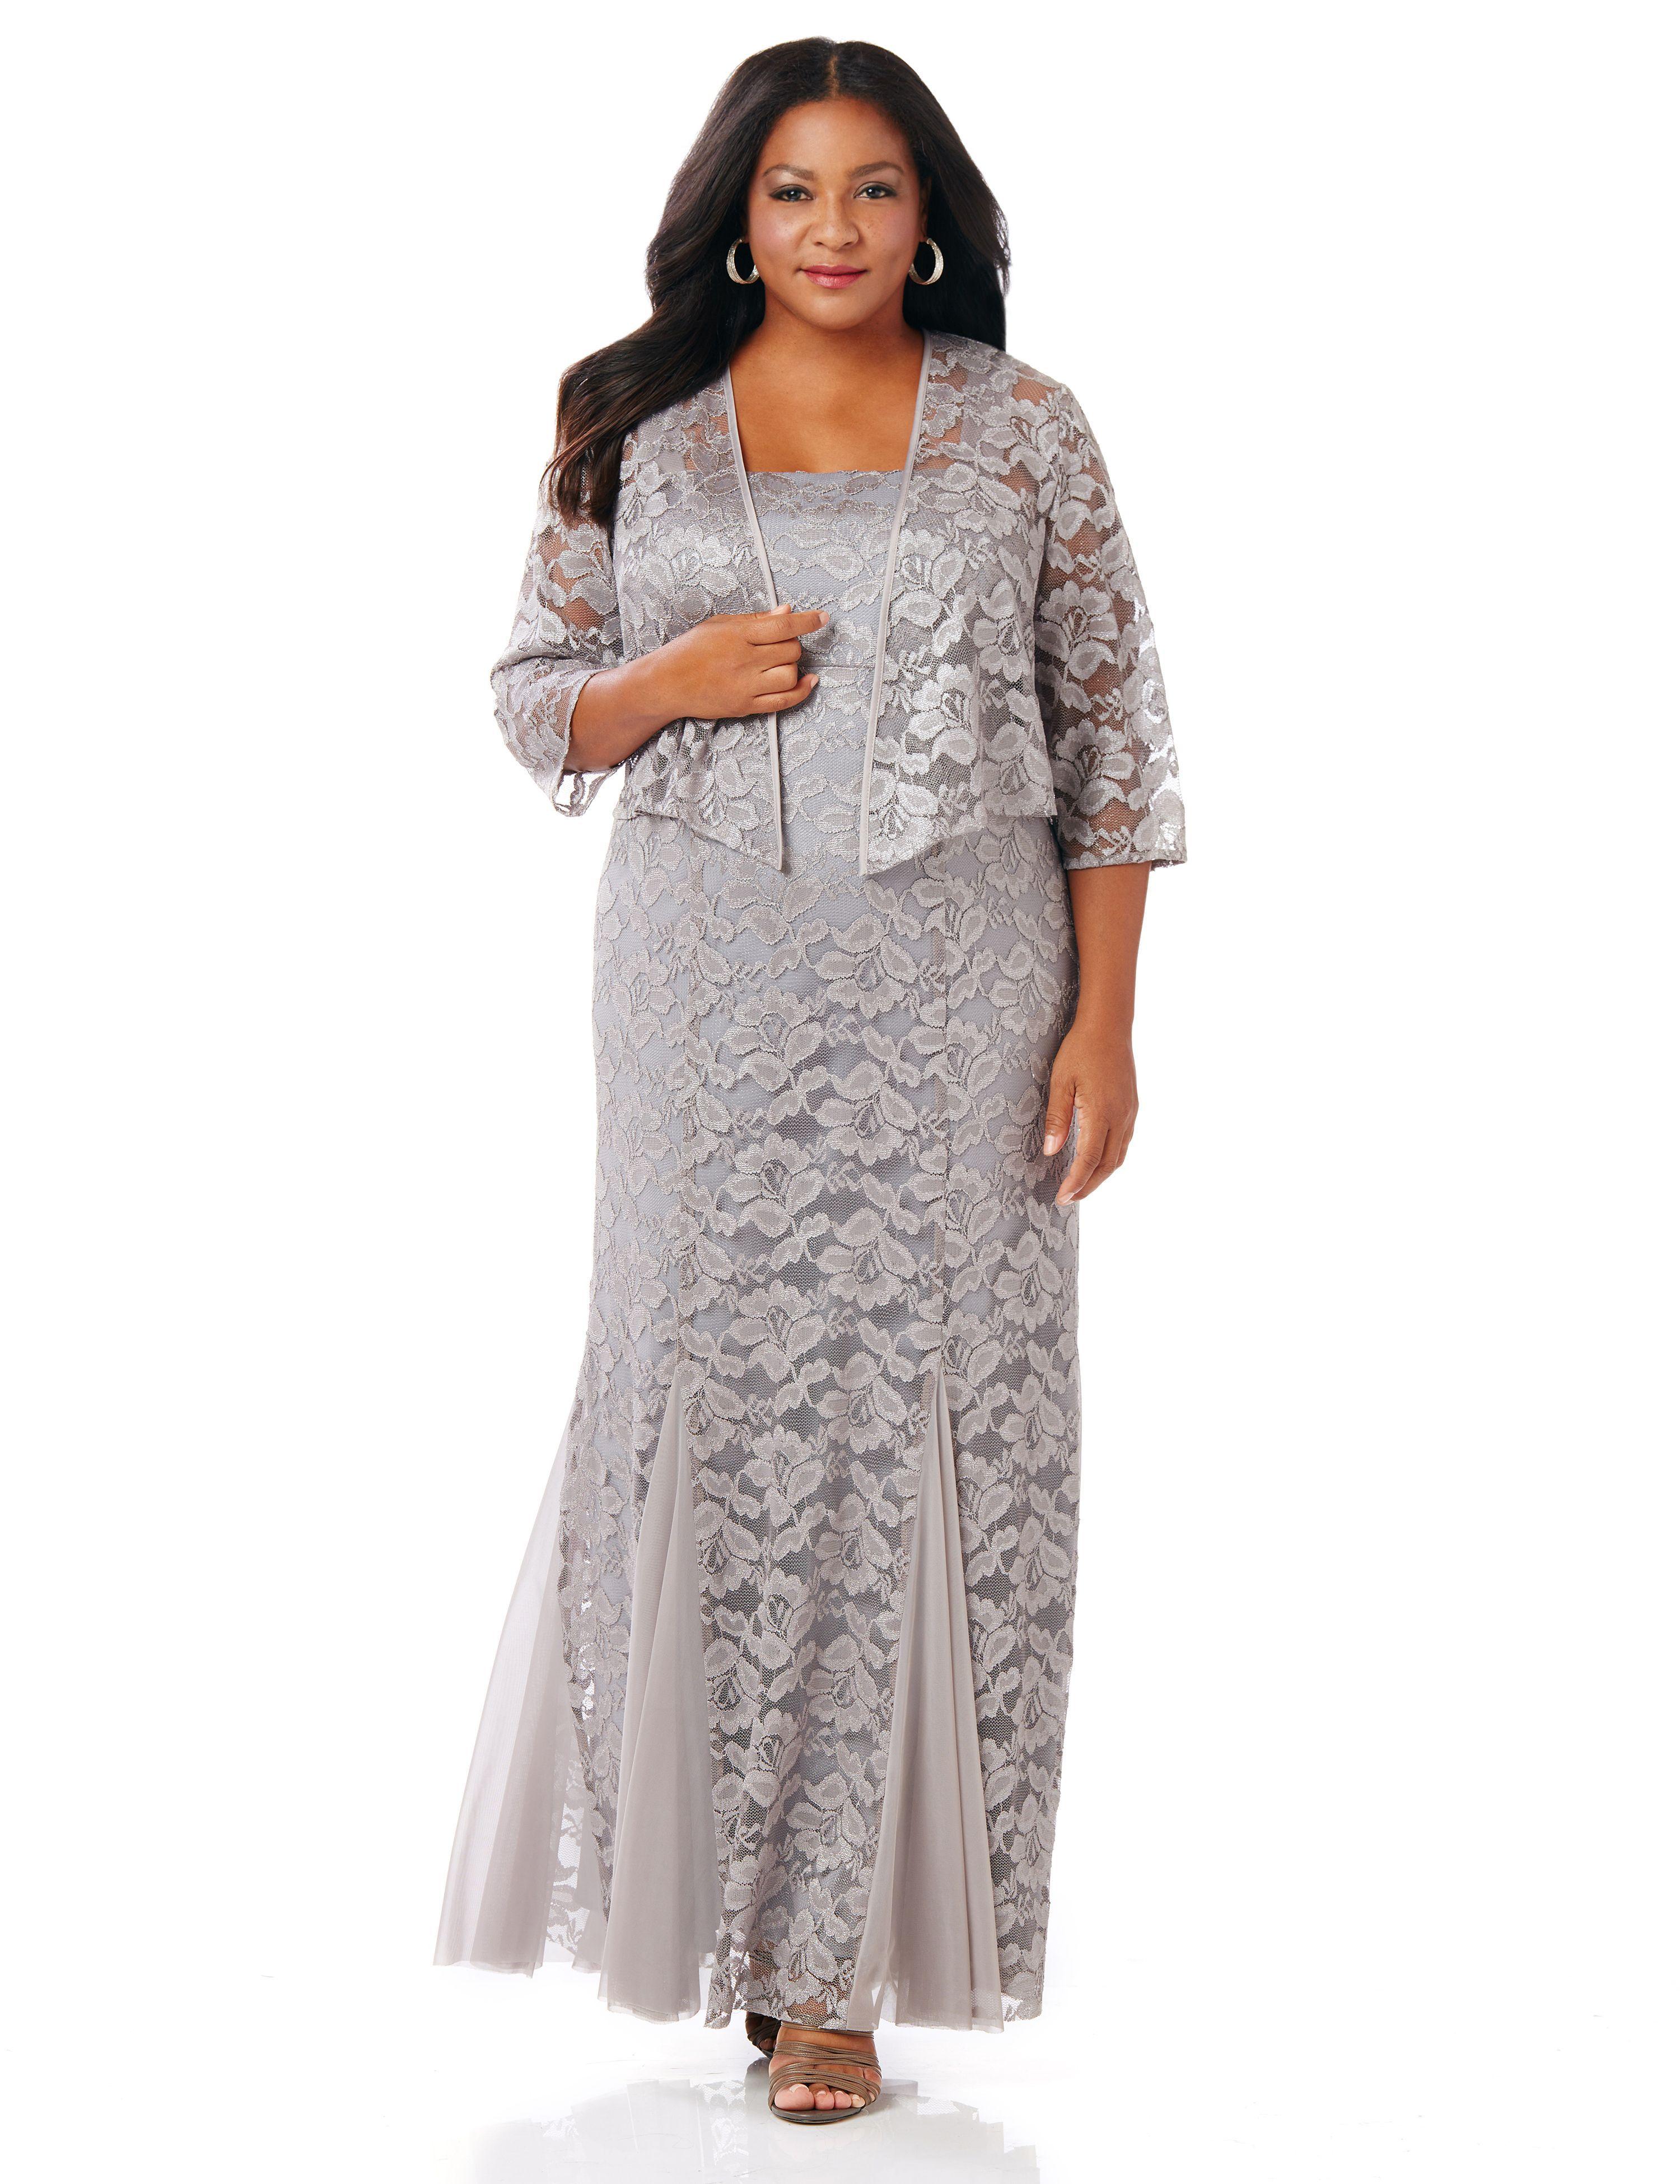 Vintage Style Wedding Dresses Vintage Inspired Wedding Gowns Plus Size Flapper Dress Vintage Inspired Wedding Gown Vintage Style Wedding Dresses [ 1275 x 1095 Pixel ]